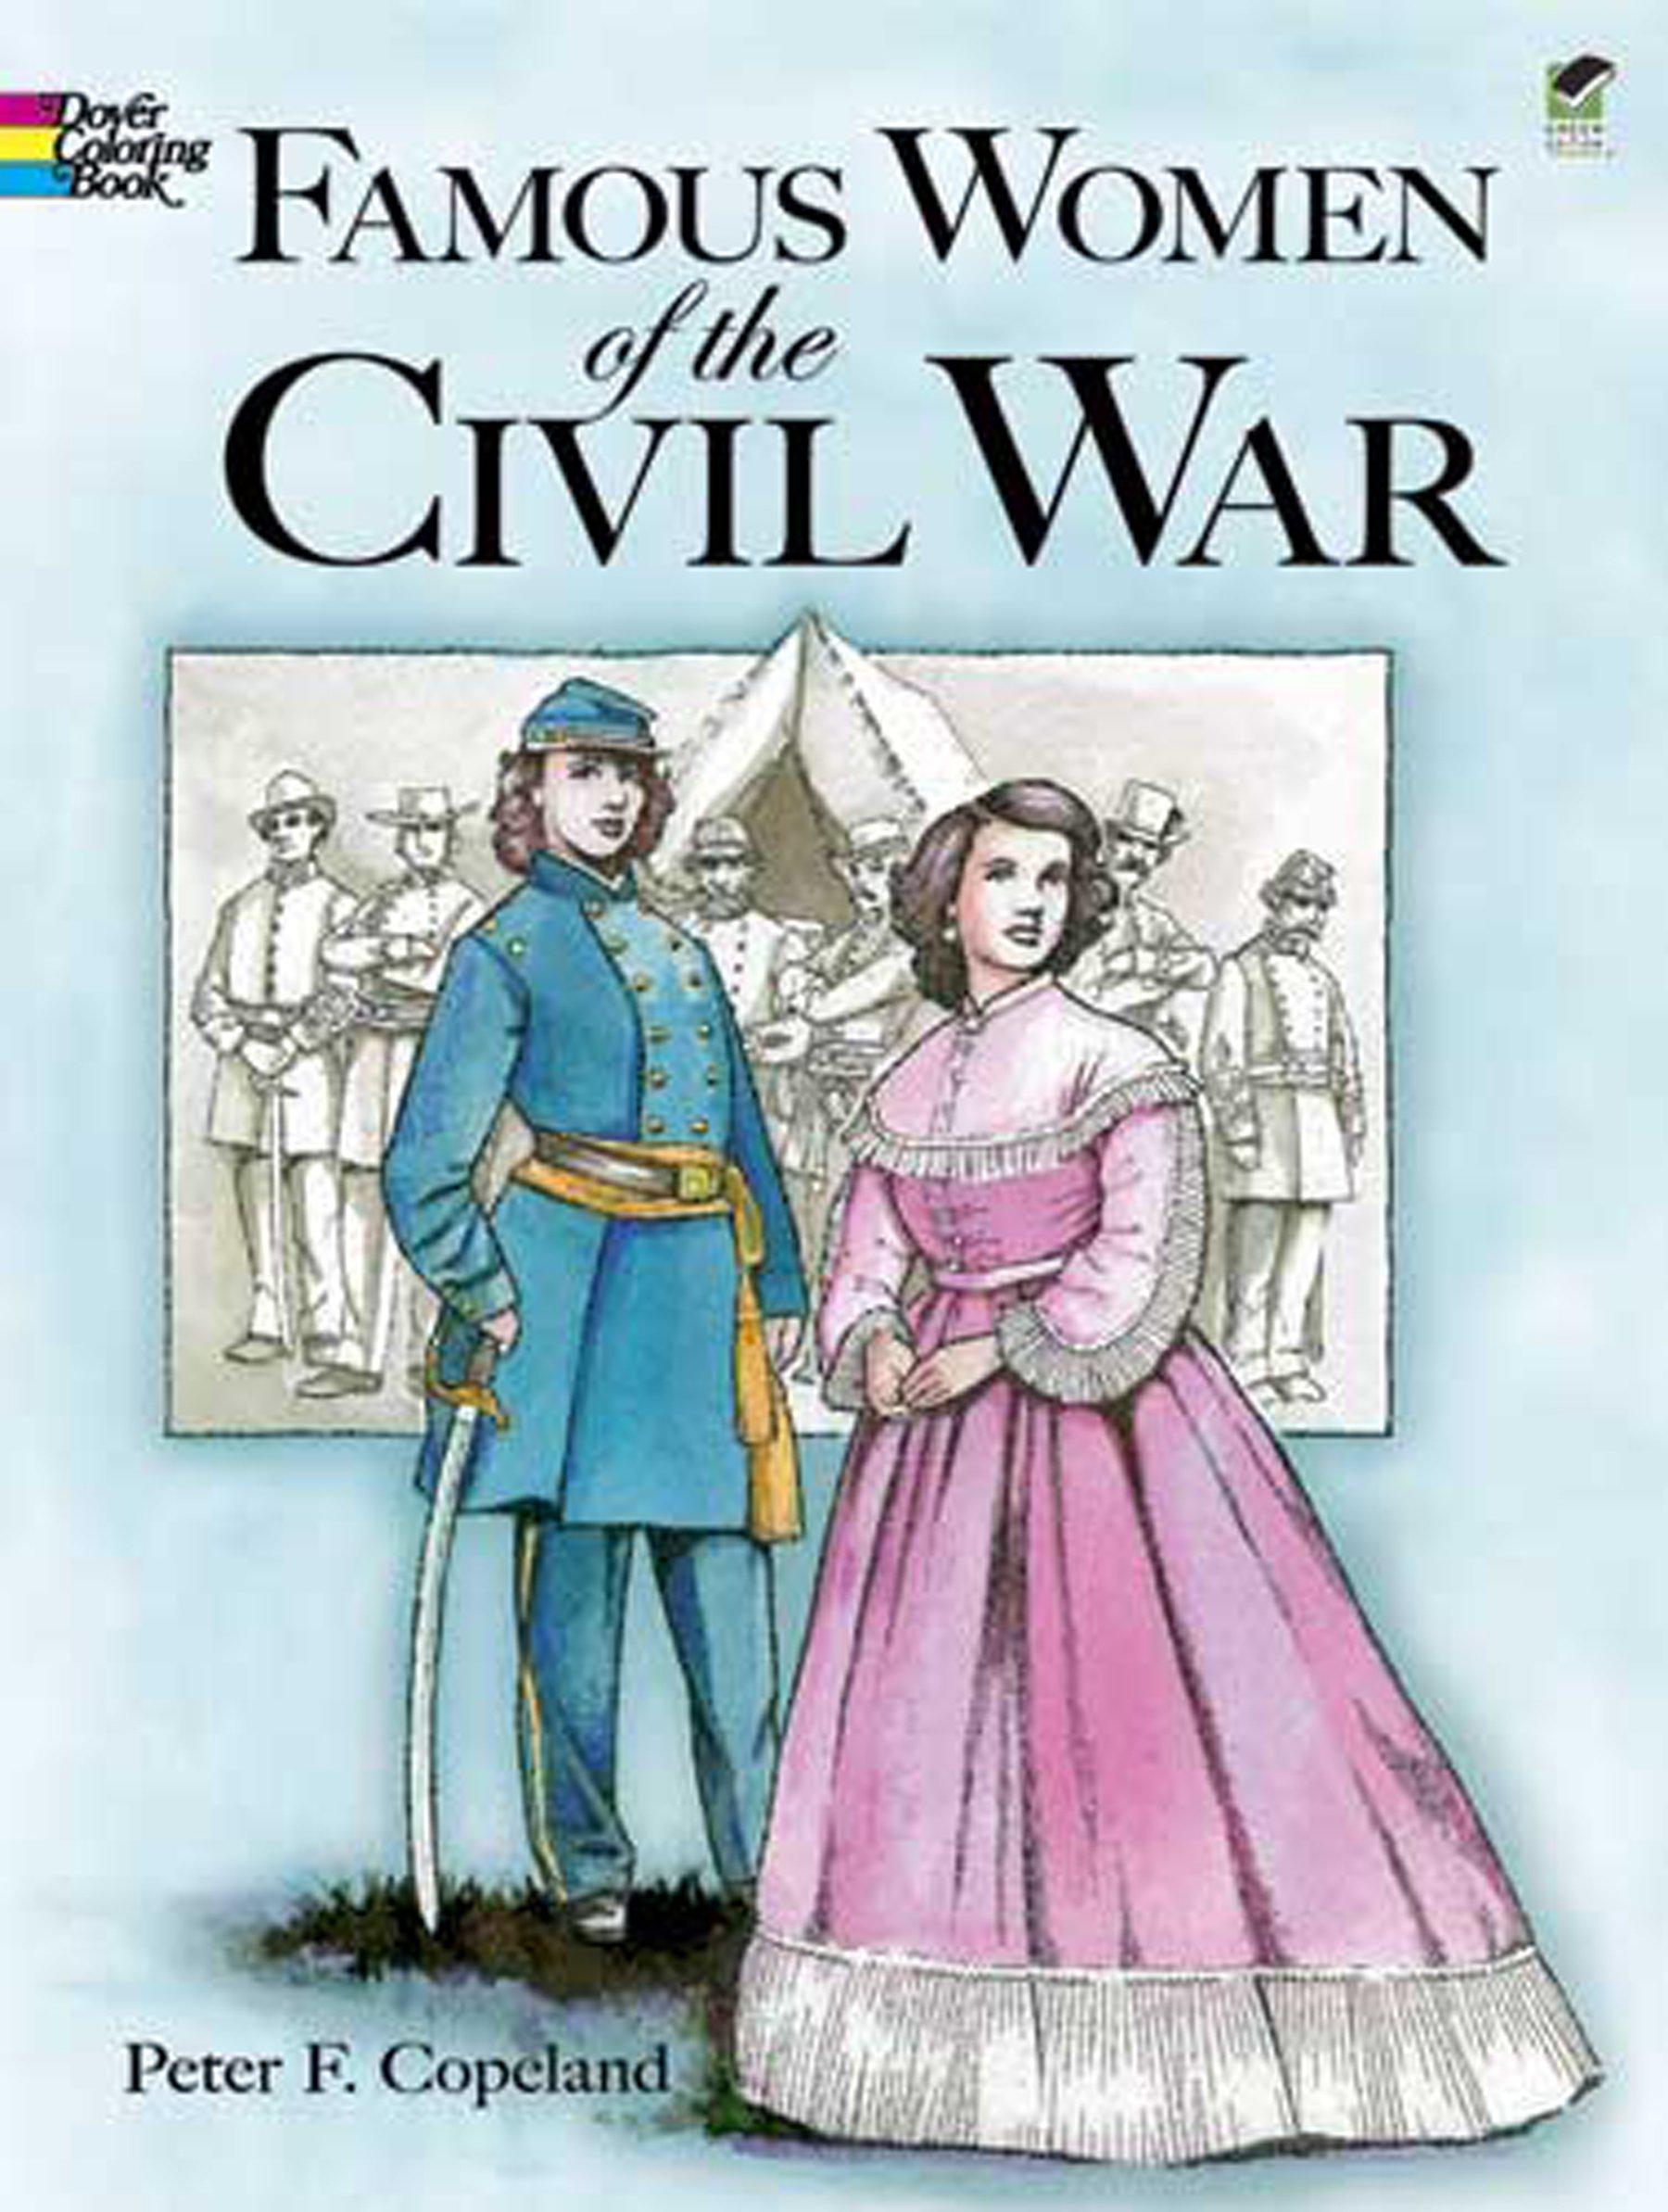 Amazon.com: Famous Women of the Civil War Coloring Book ...